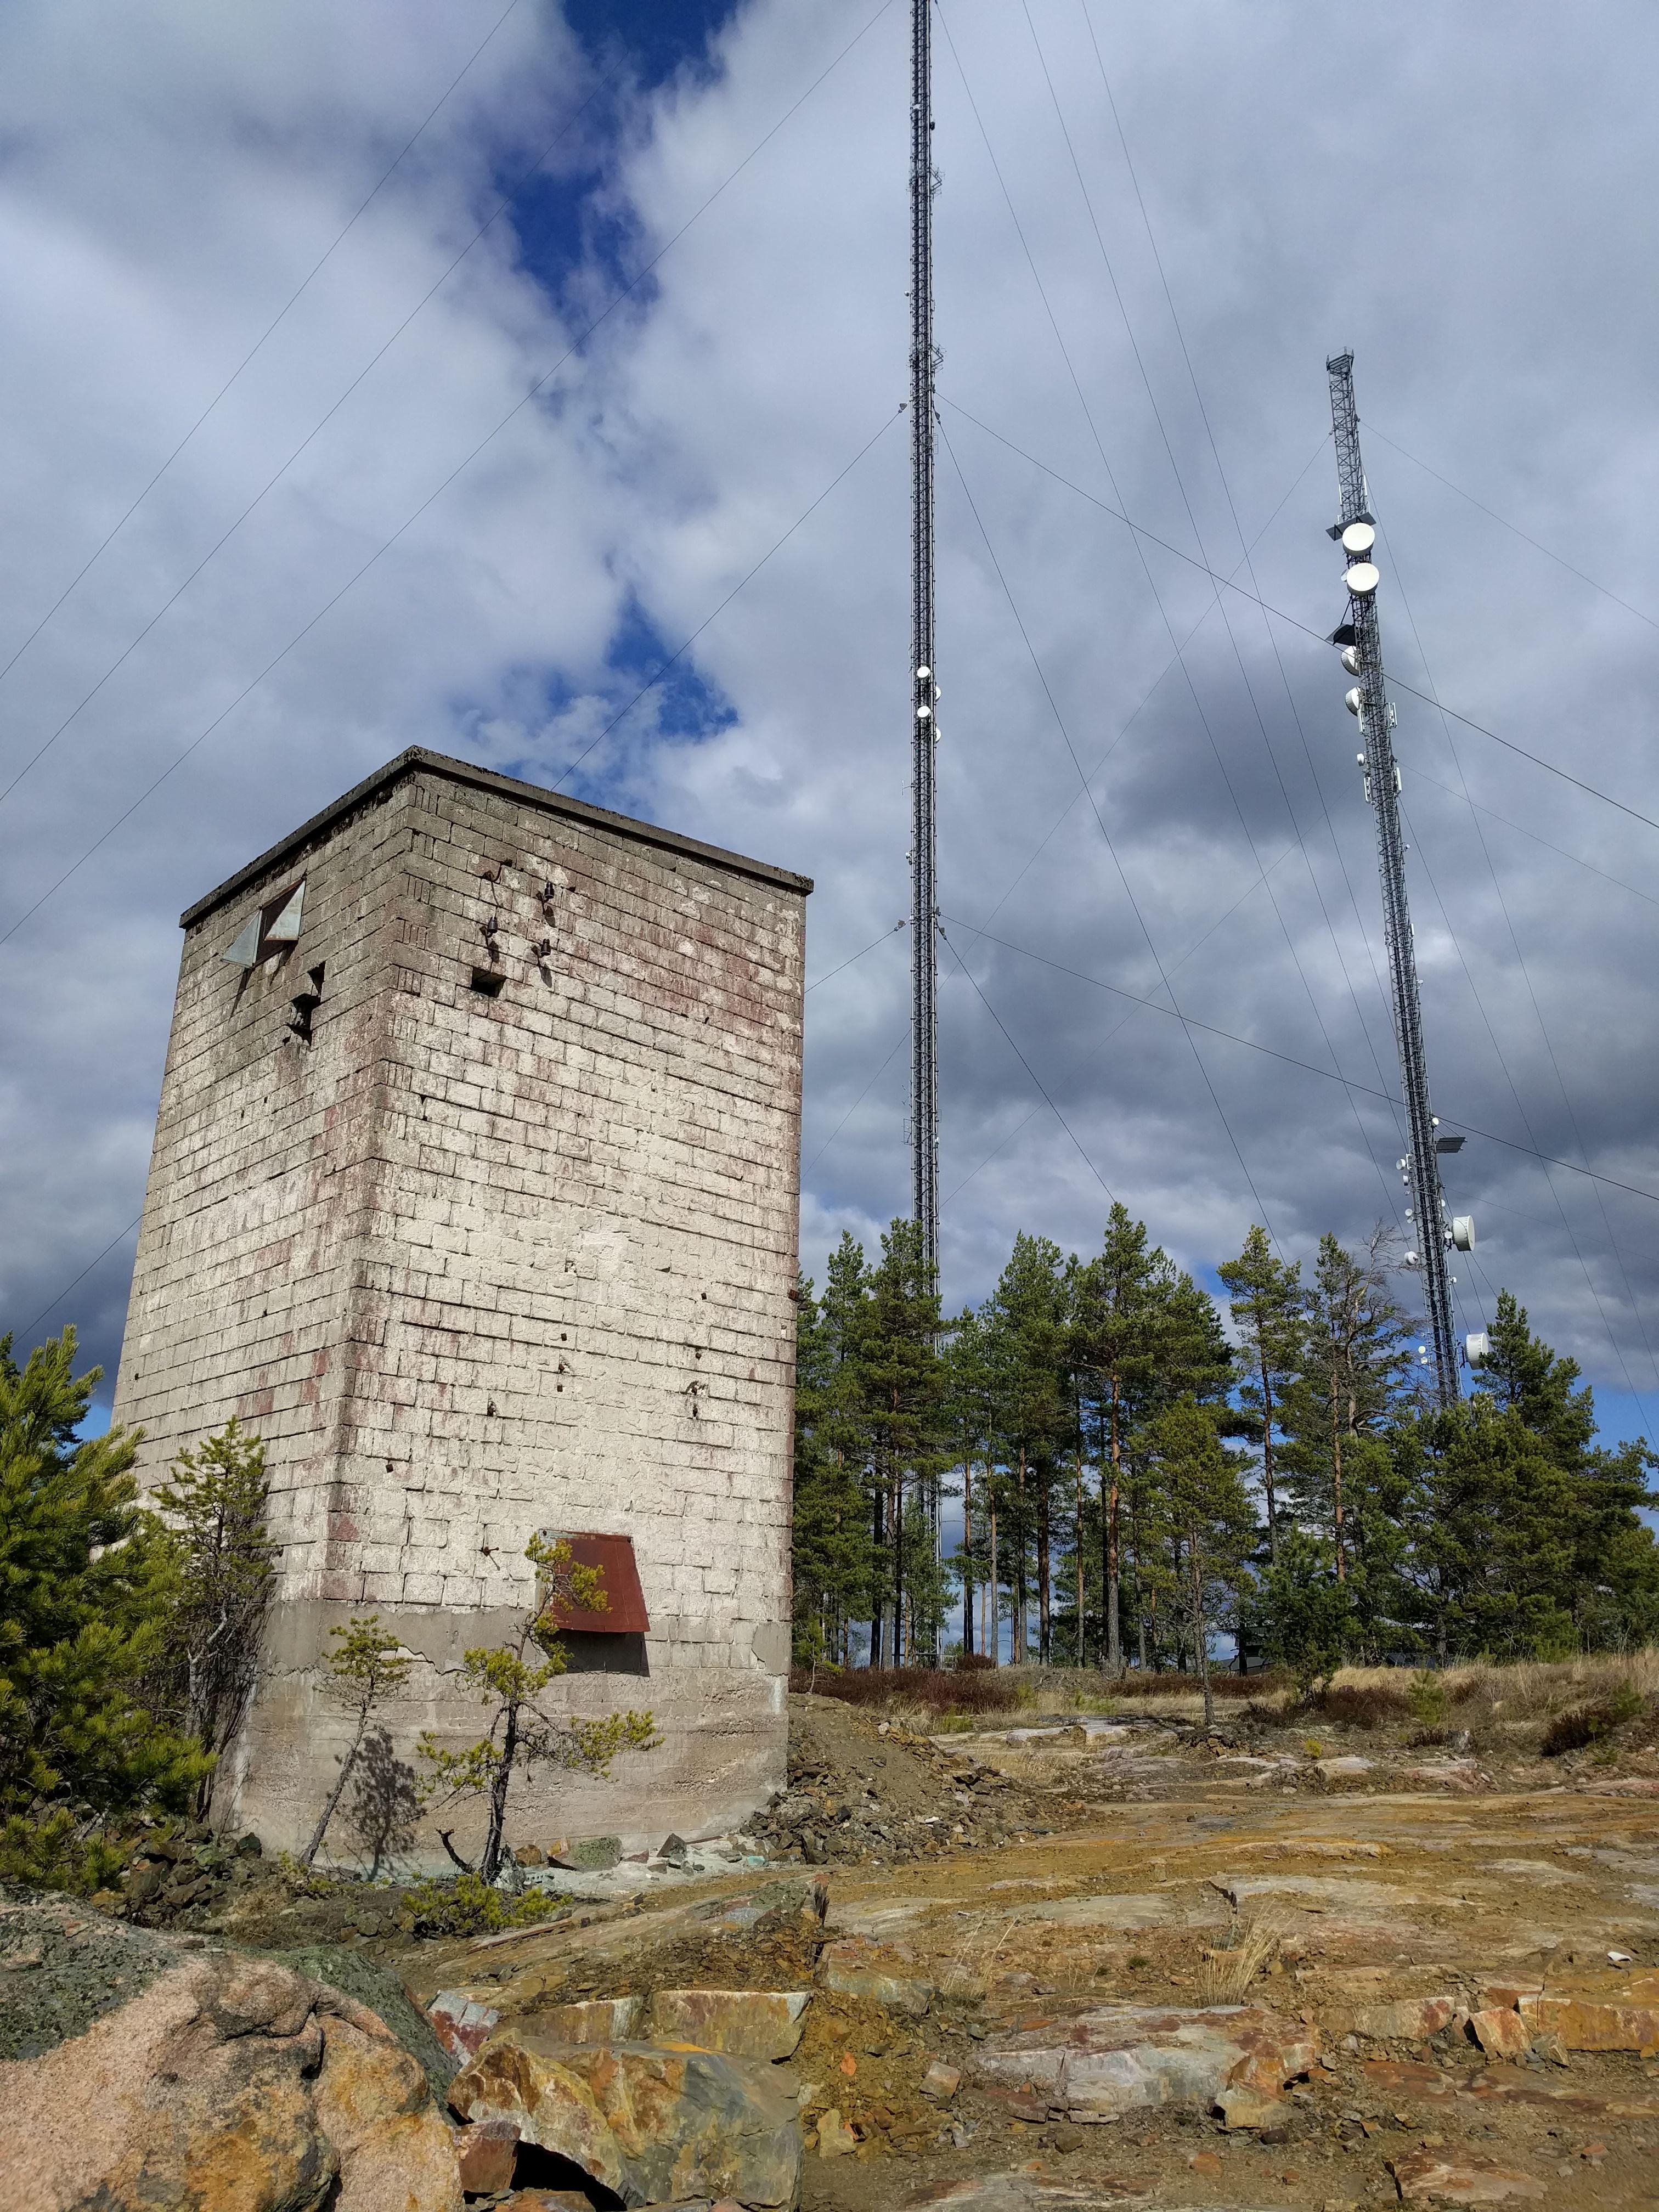 Gladhammar mines